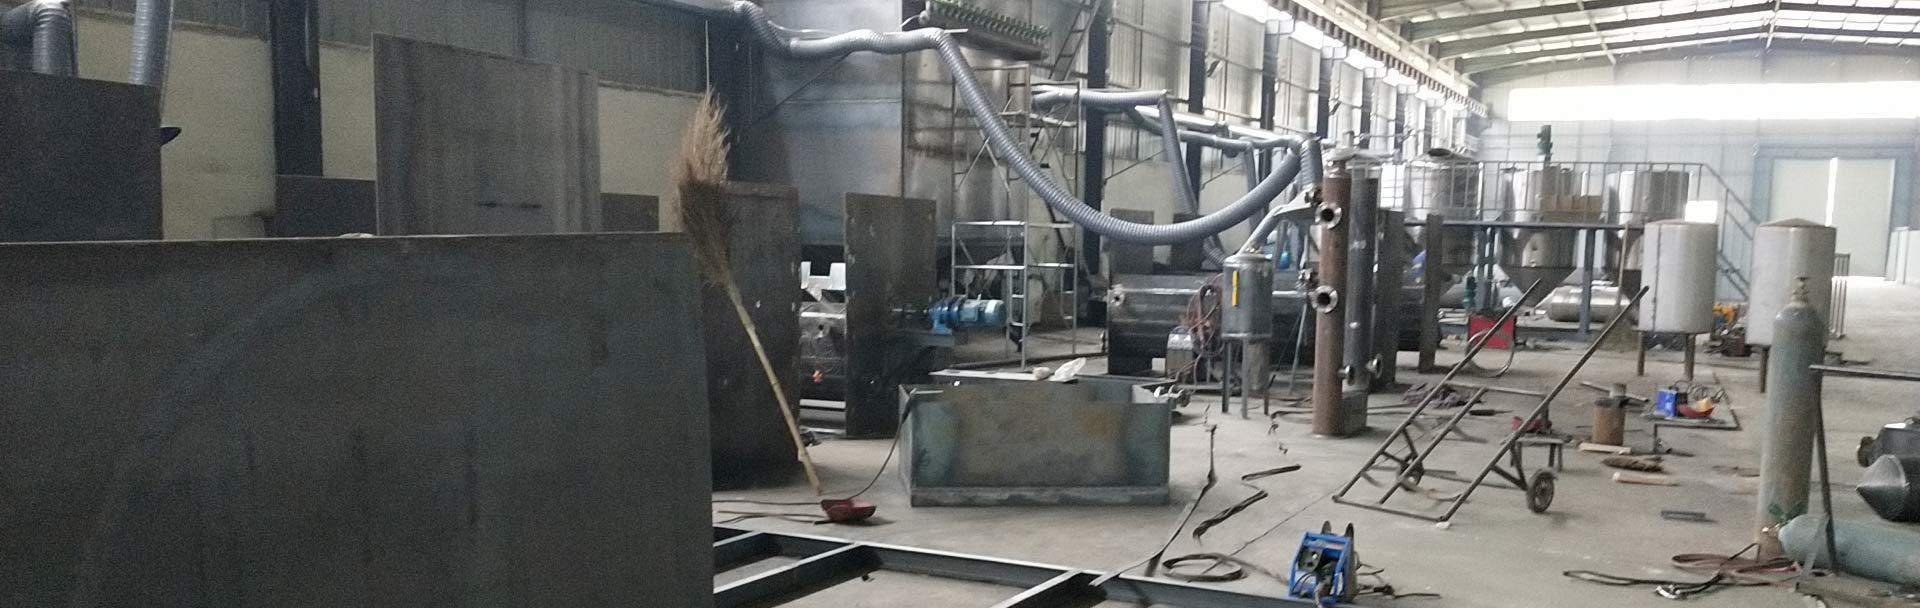 Henan Lingfine Machinery Co., LTD.